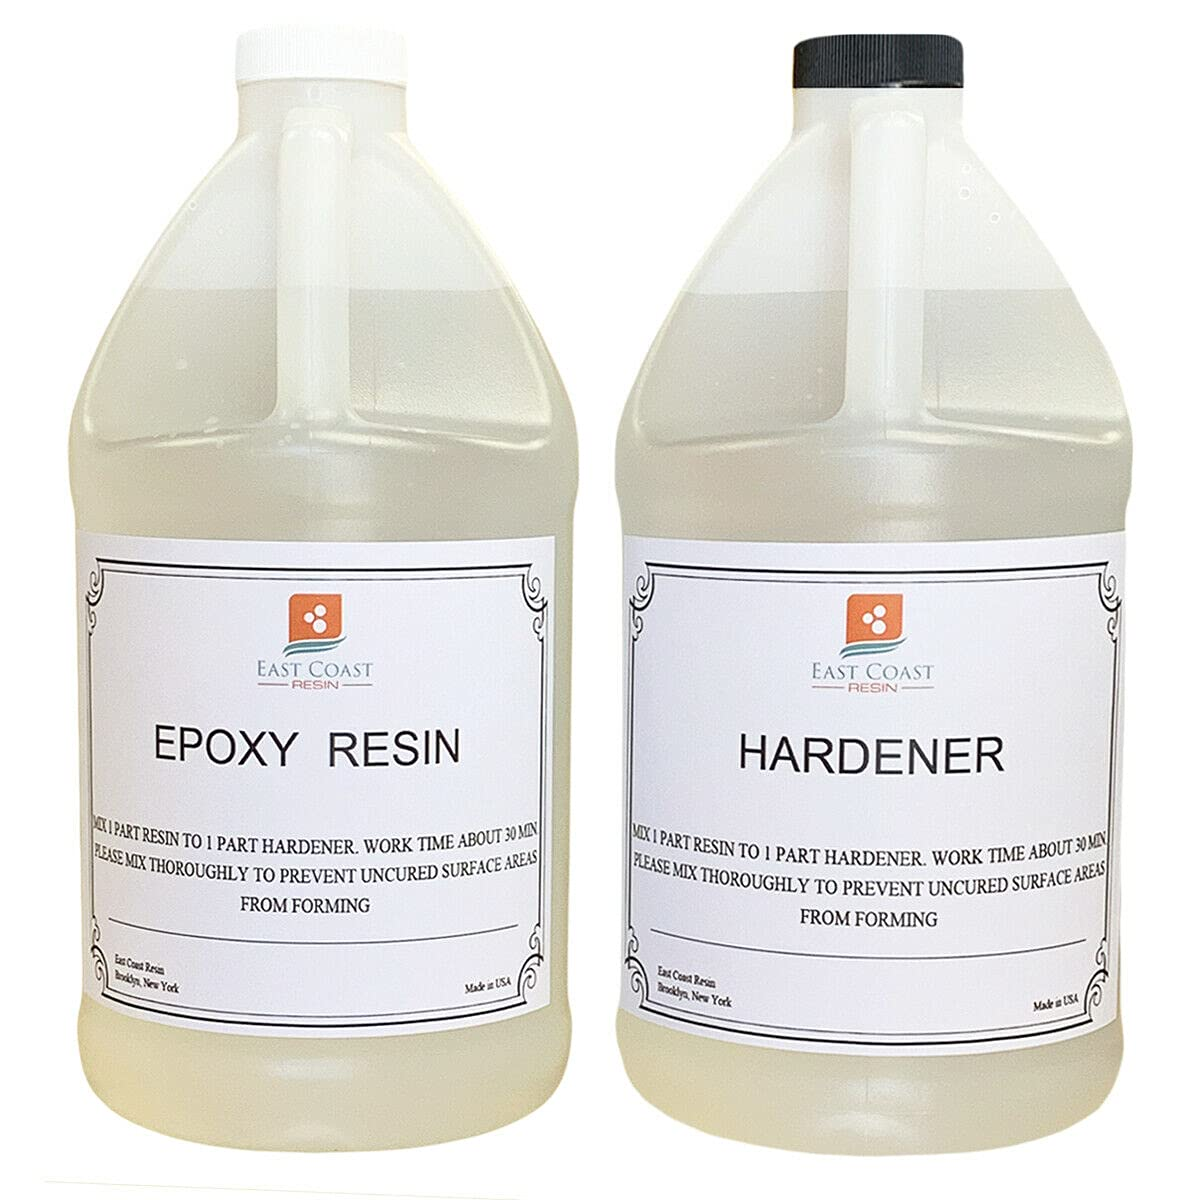 2 Pcs Sale New item item of EPOXY Resin 1 Gal Super General kit Purpose Gloss for